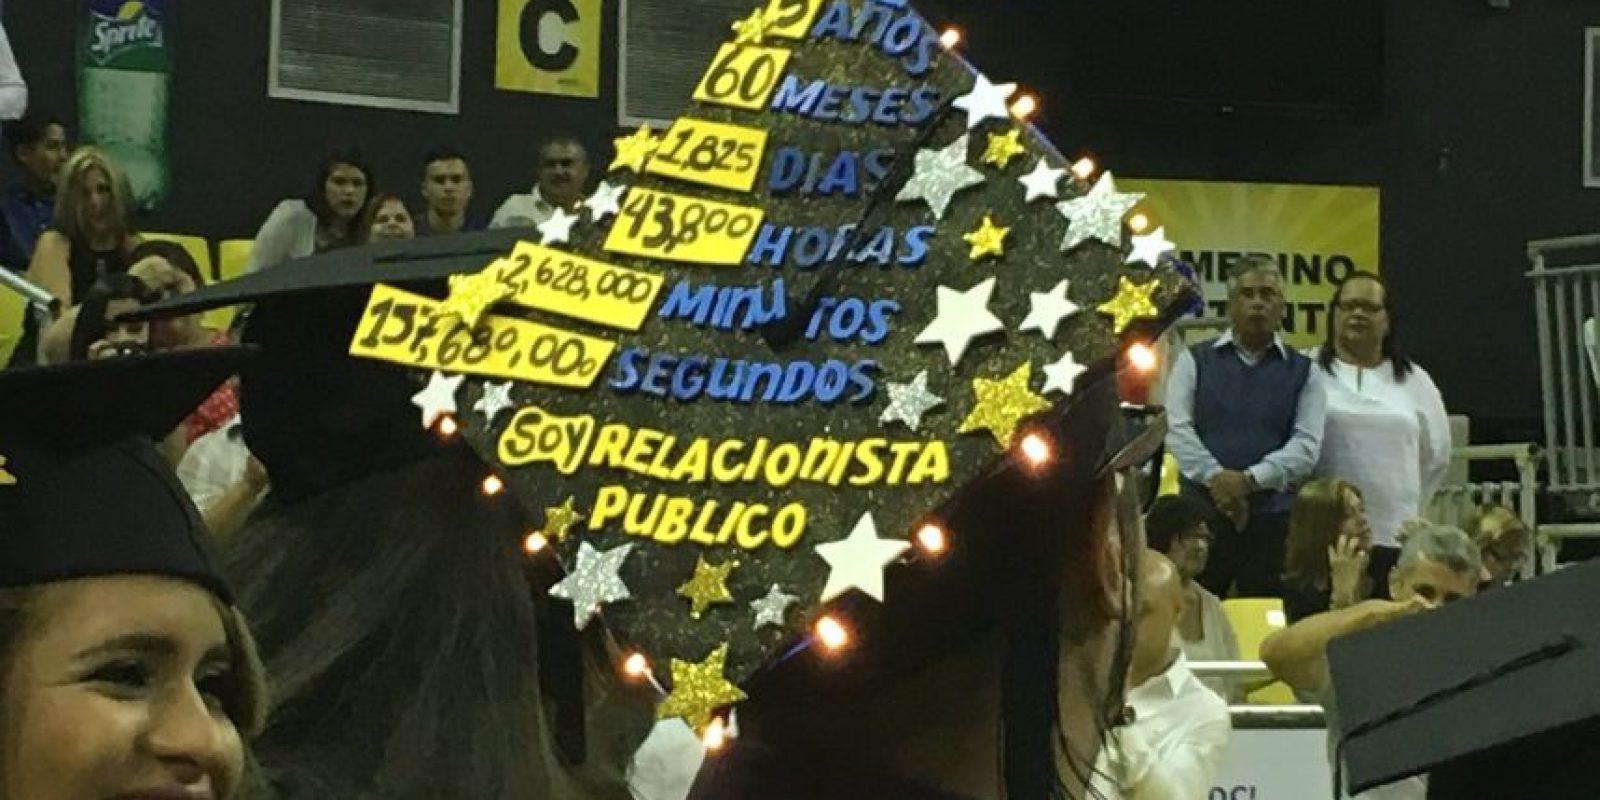 Foto:Twitter UPR Informa. Imagen Por: